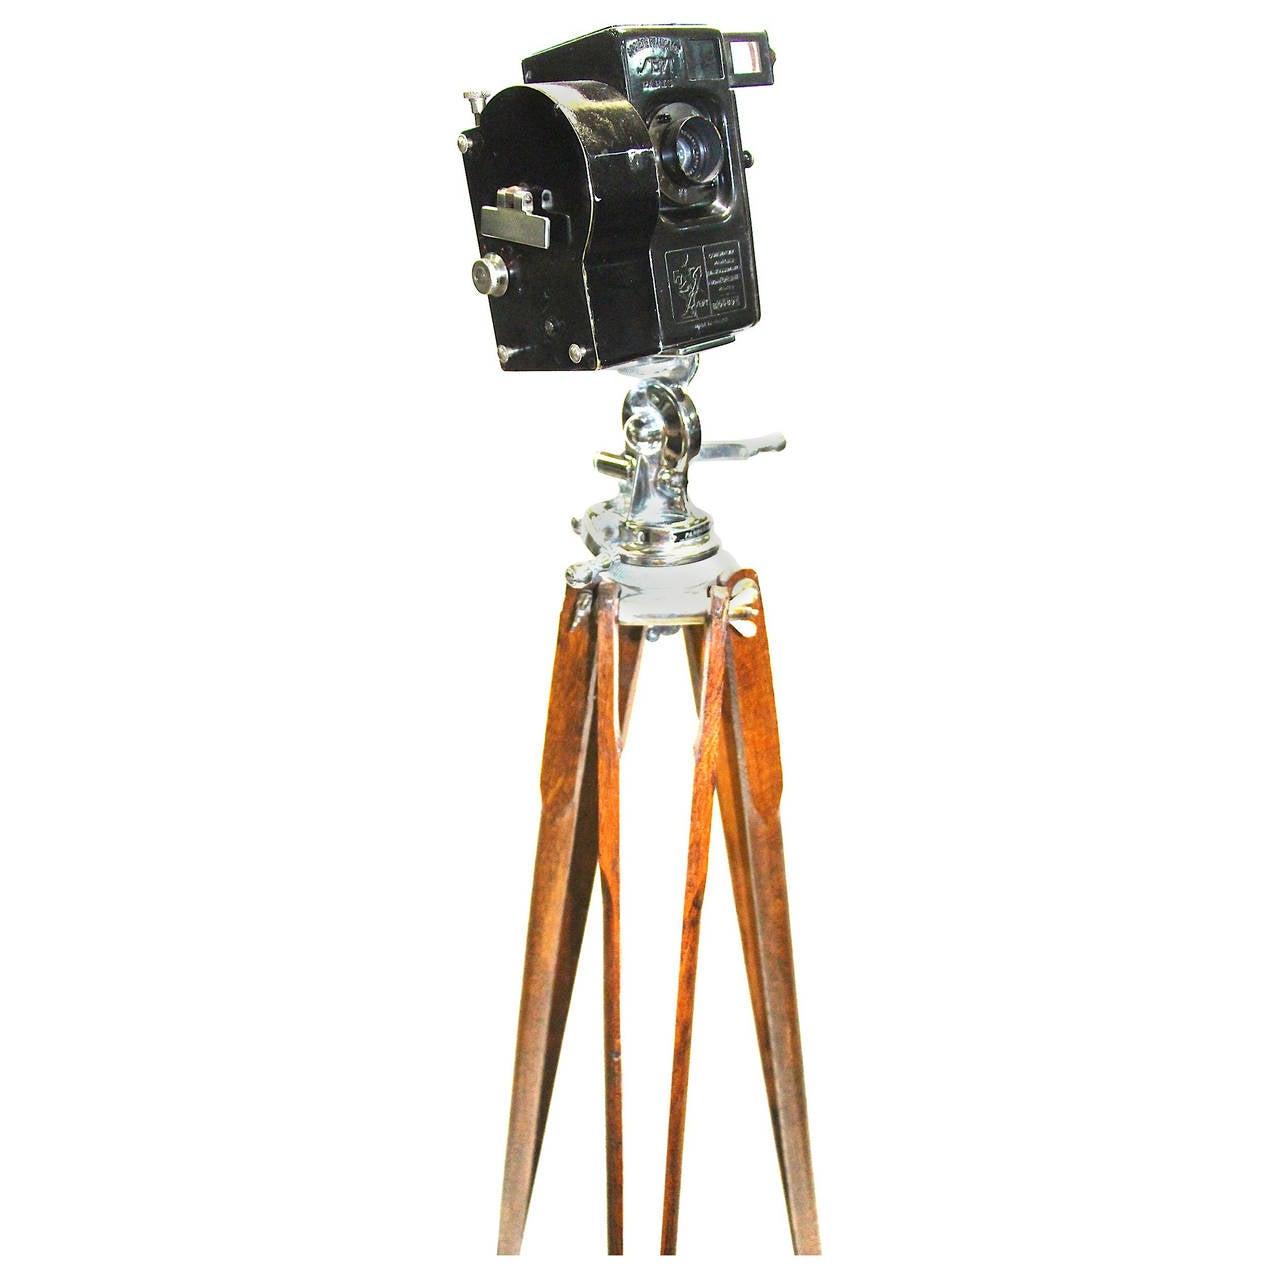 Andre Debrie, Circa 1923 Sept Model 35mm Cinema Camera on Tripod. As Sculpture.